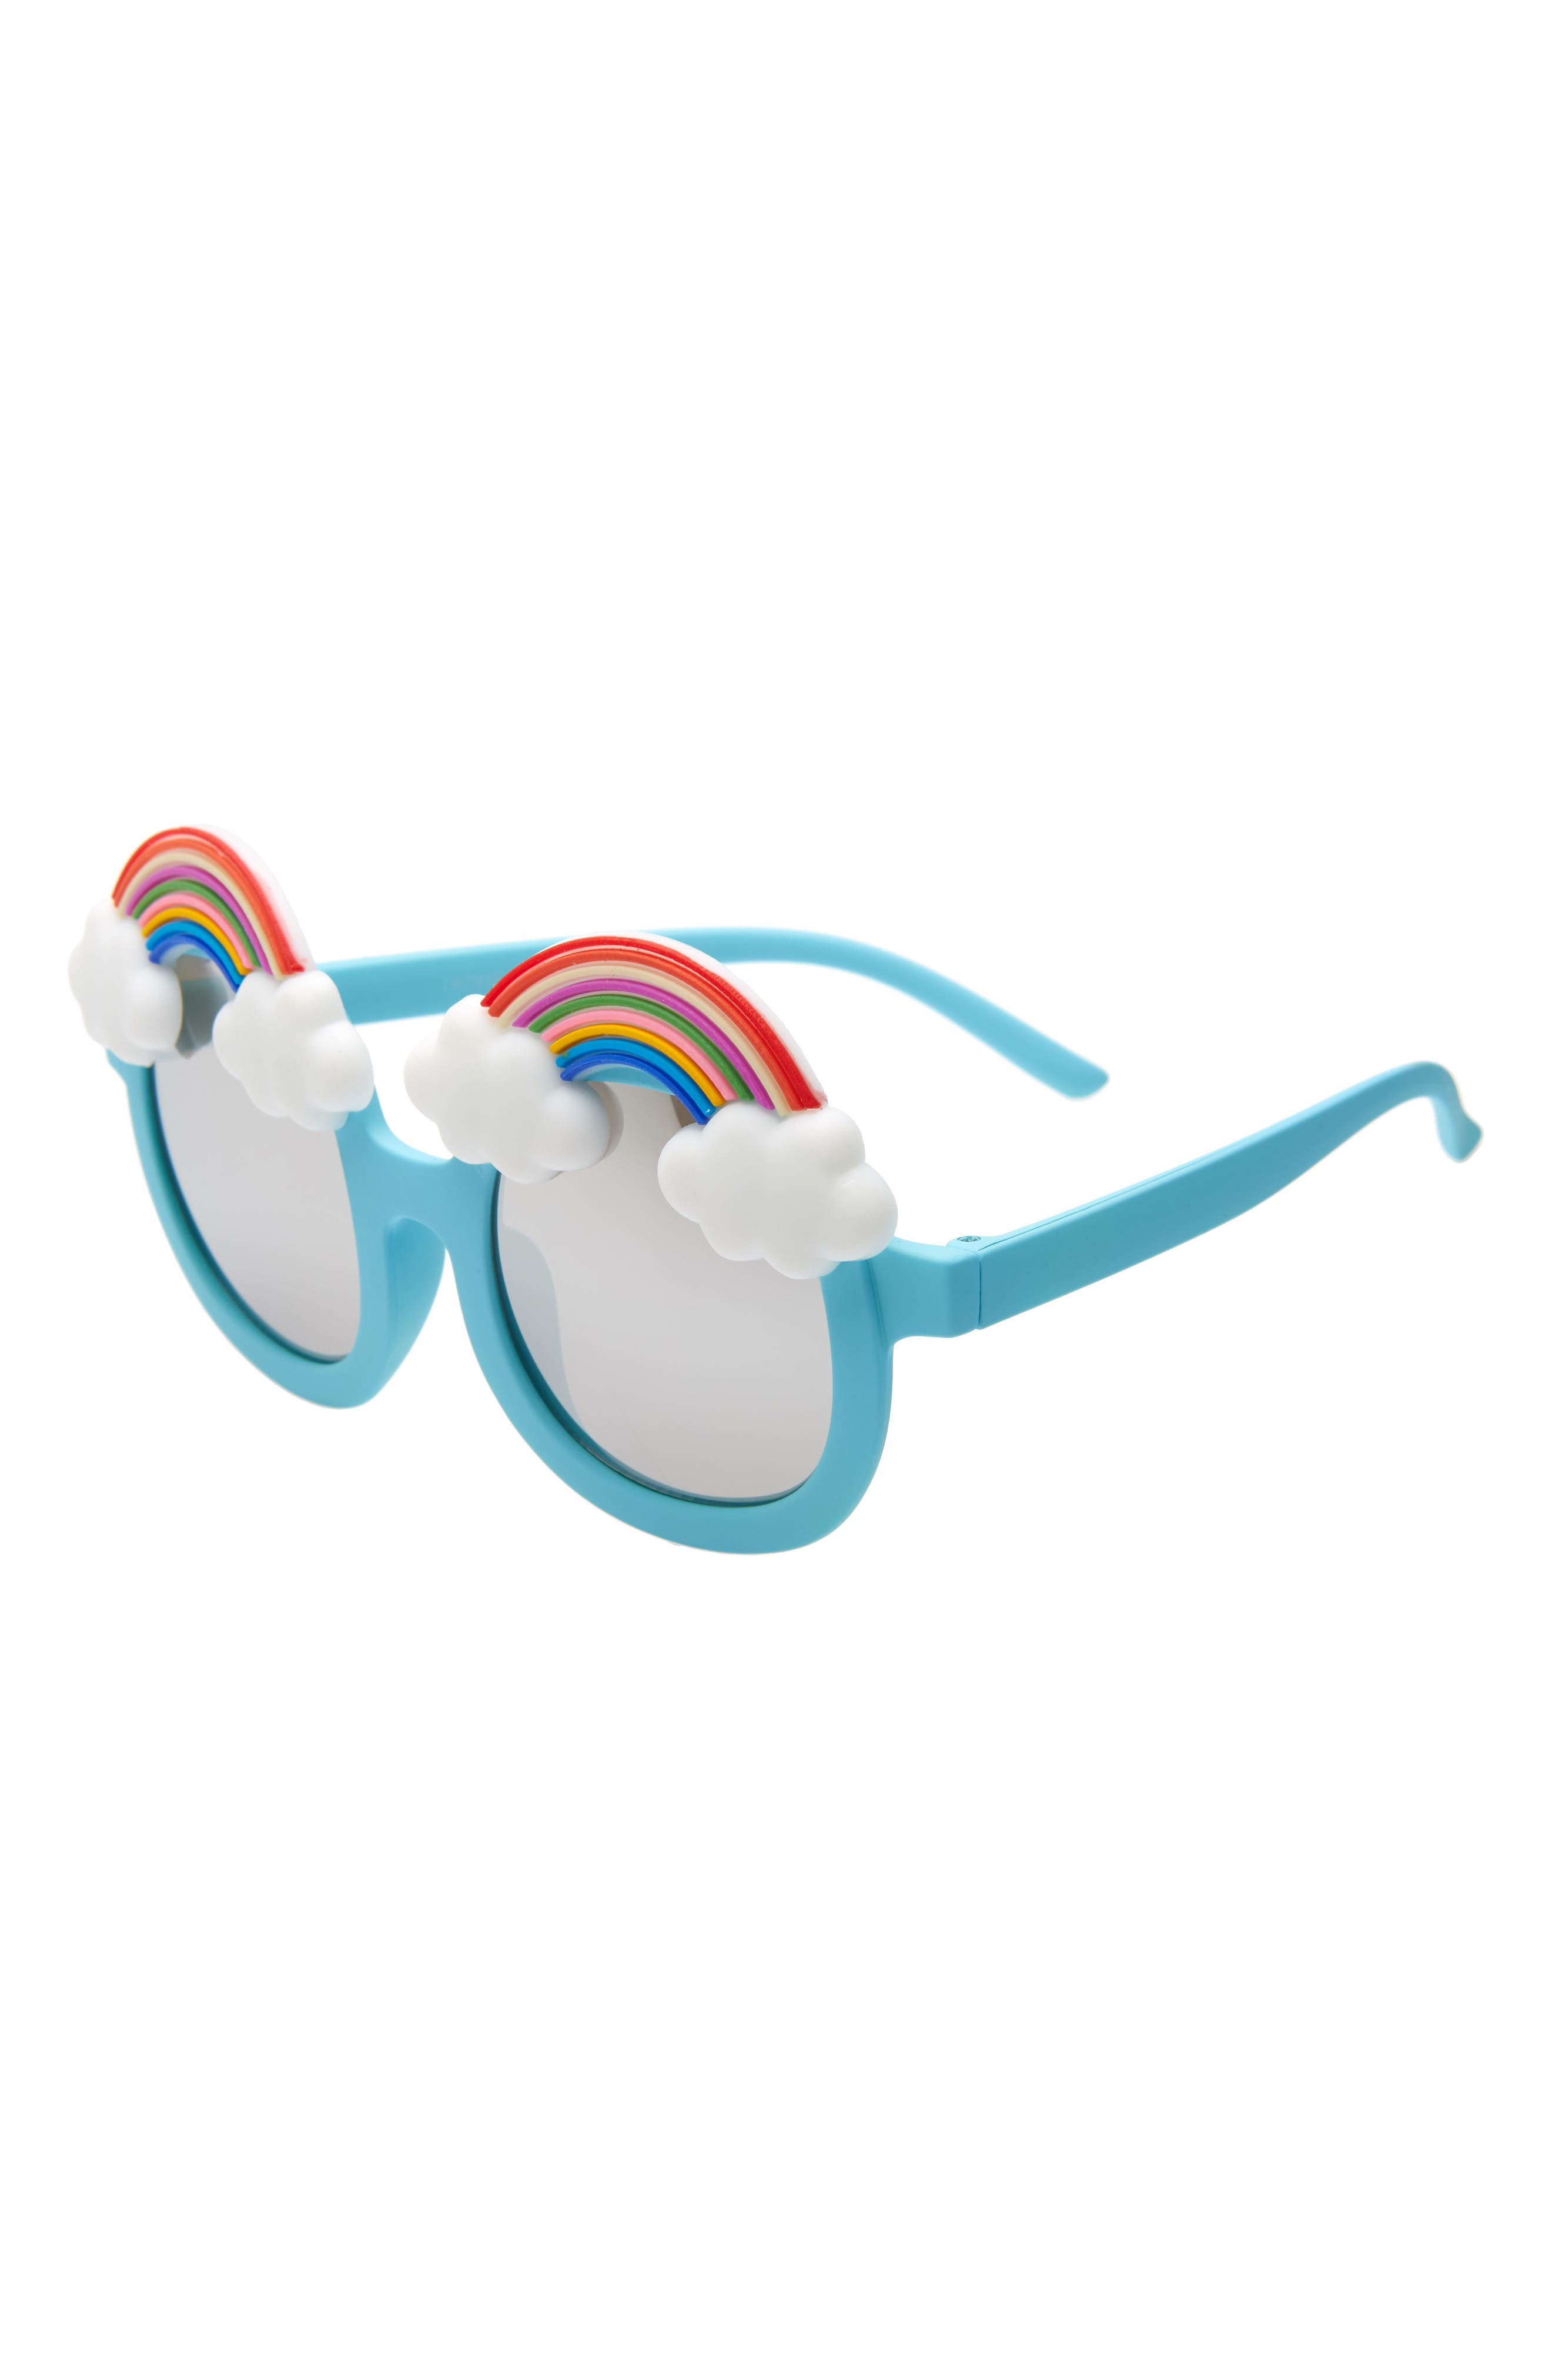 Rainbow Mirrored Sunglasses,                             Main thumbnail 1, color,                             BLUE